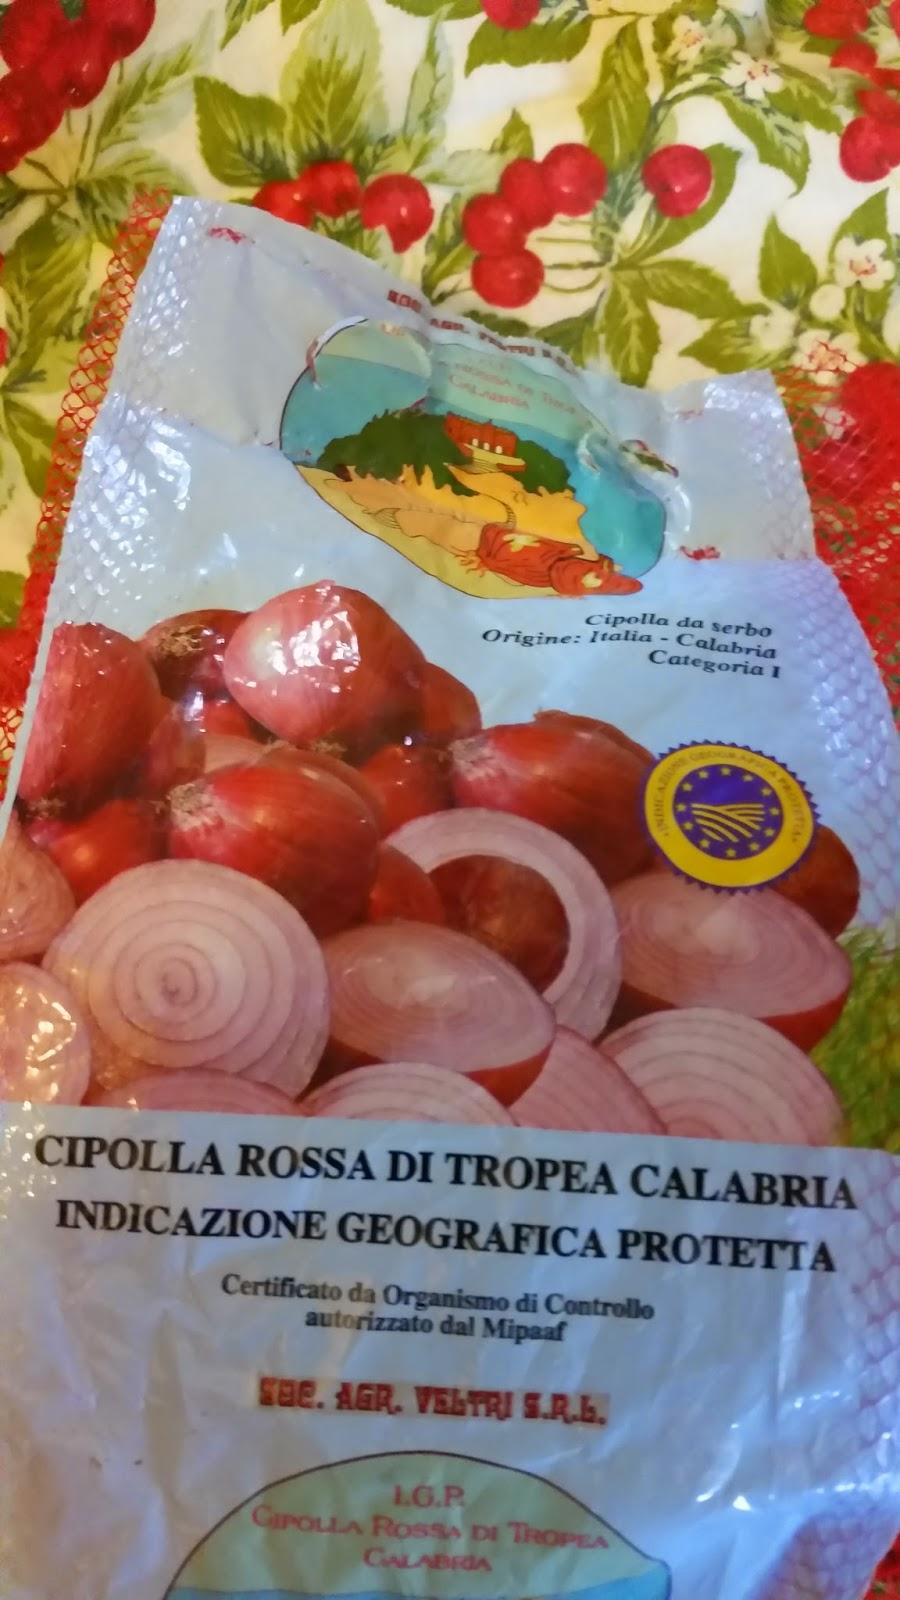 http://www.passaparolablog.com/2014/10/recensione-fontanara-preziosi-olii.html